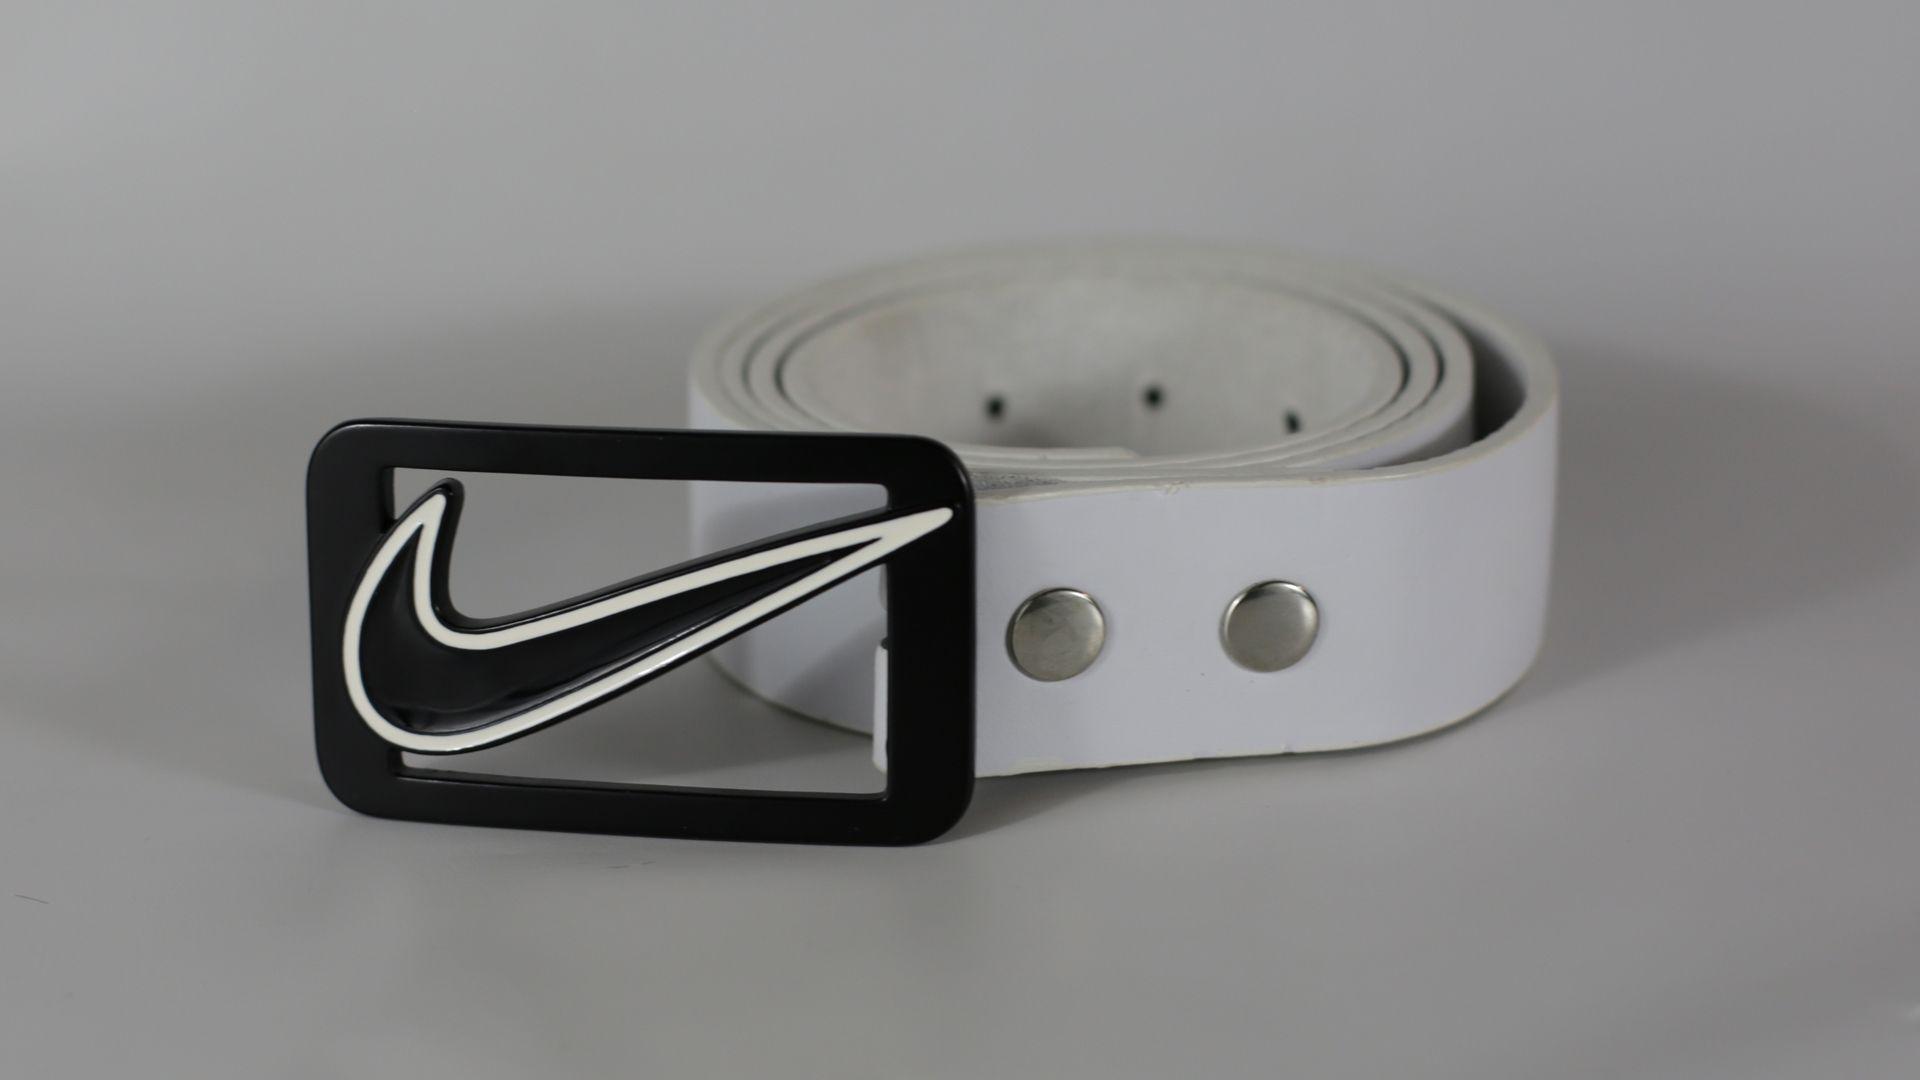 31446e1a50b3f1 Nike Swoosh Logo Enamel Golf Belt Buckle with White Leather Belt XL 42